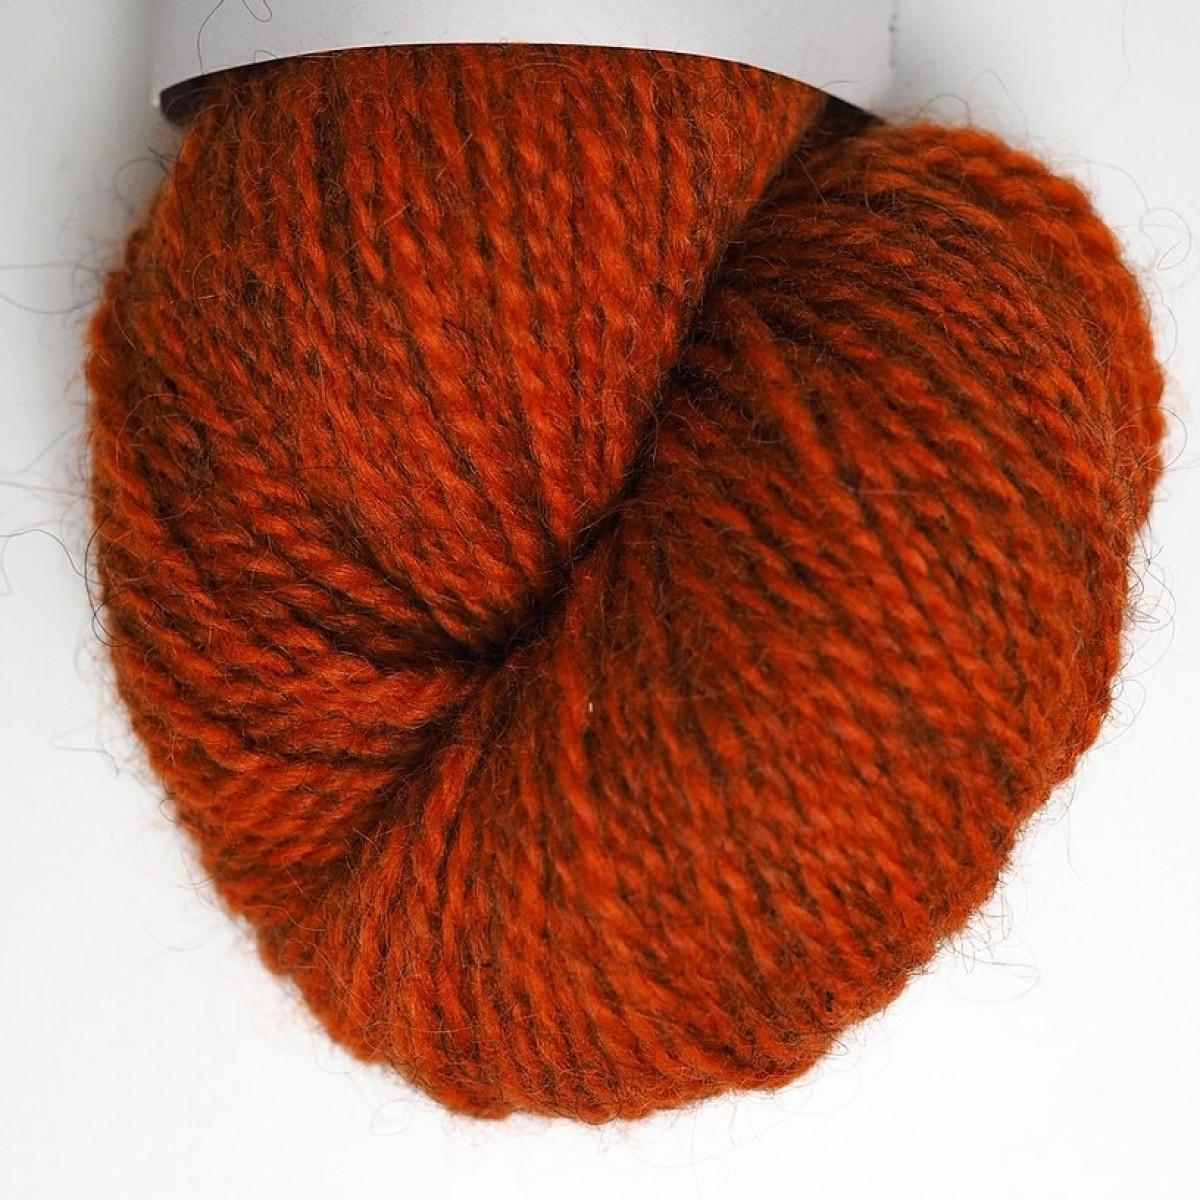 Stormsweater